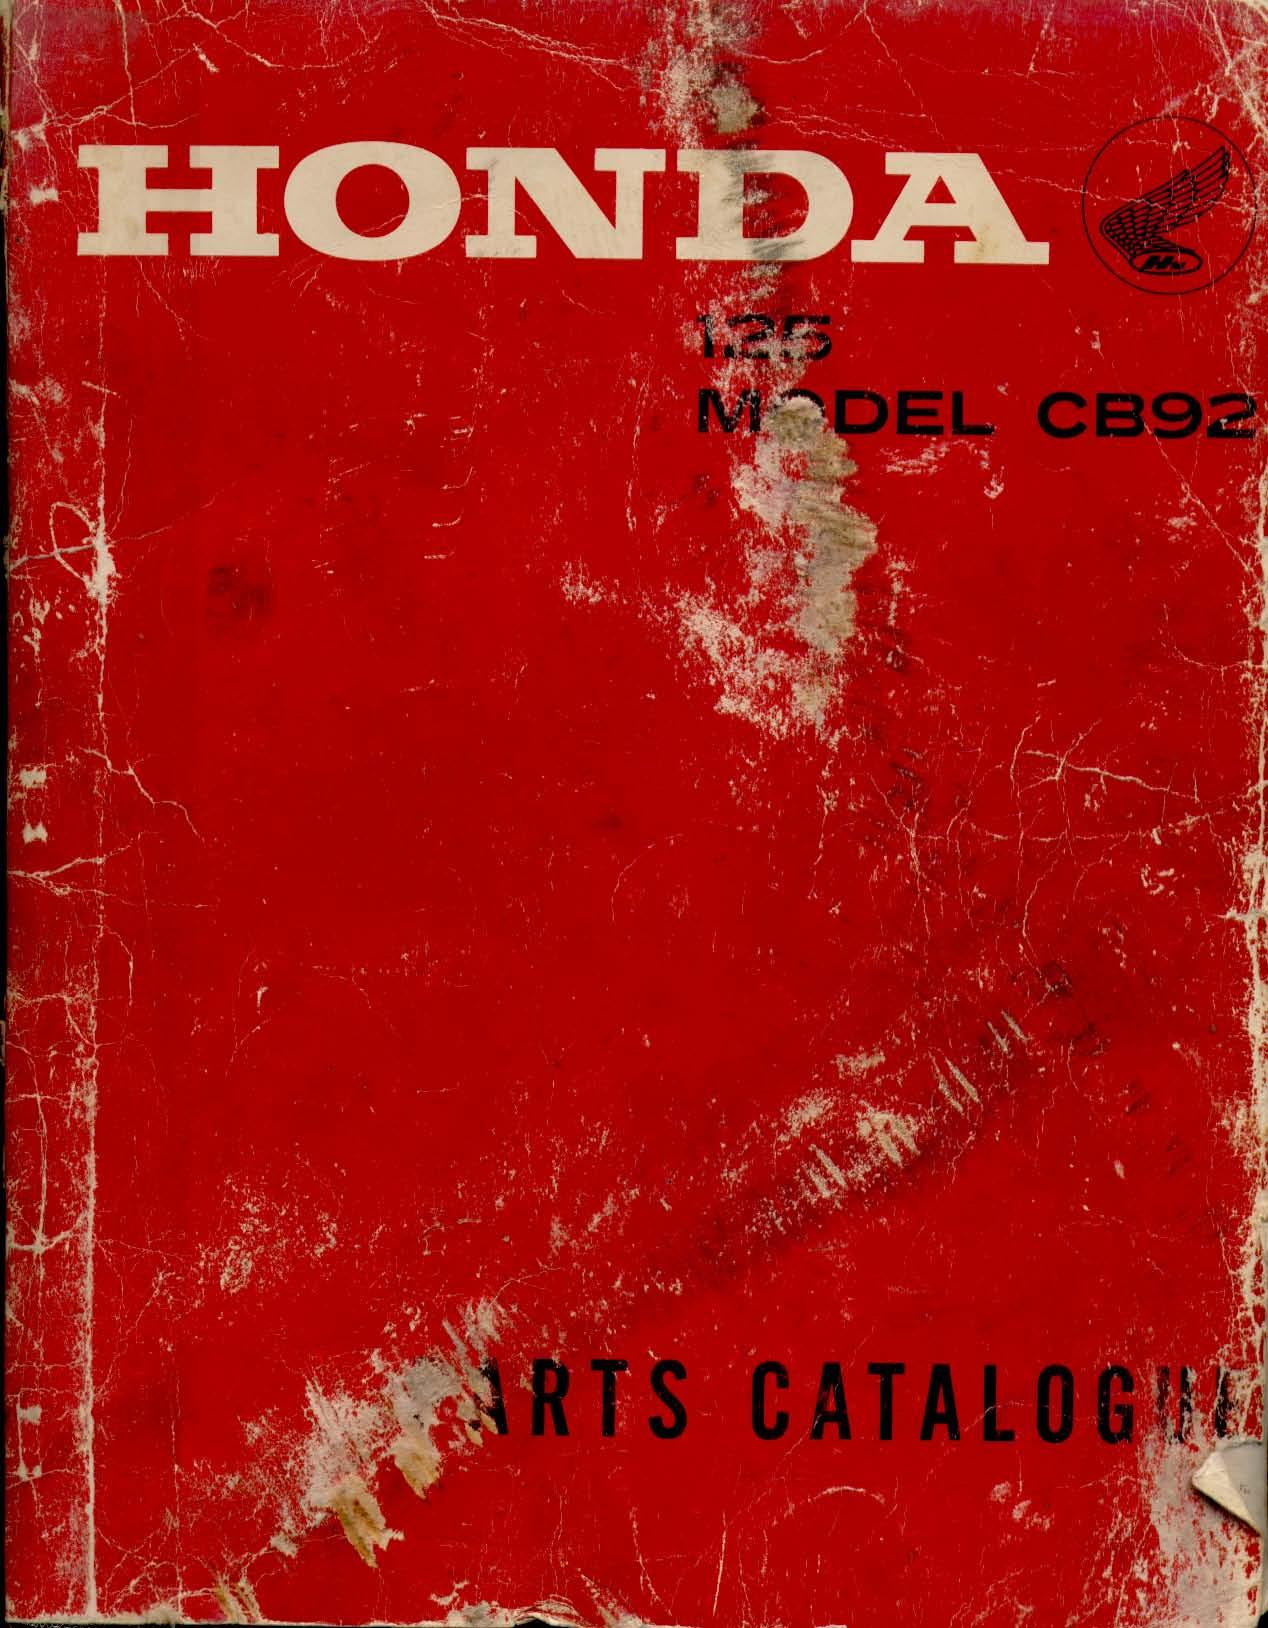 Parts List for Honda CB92 (1966)